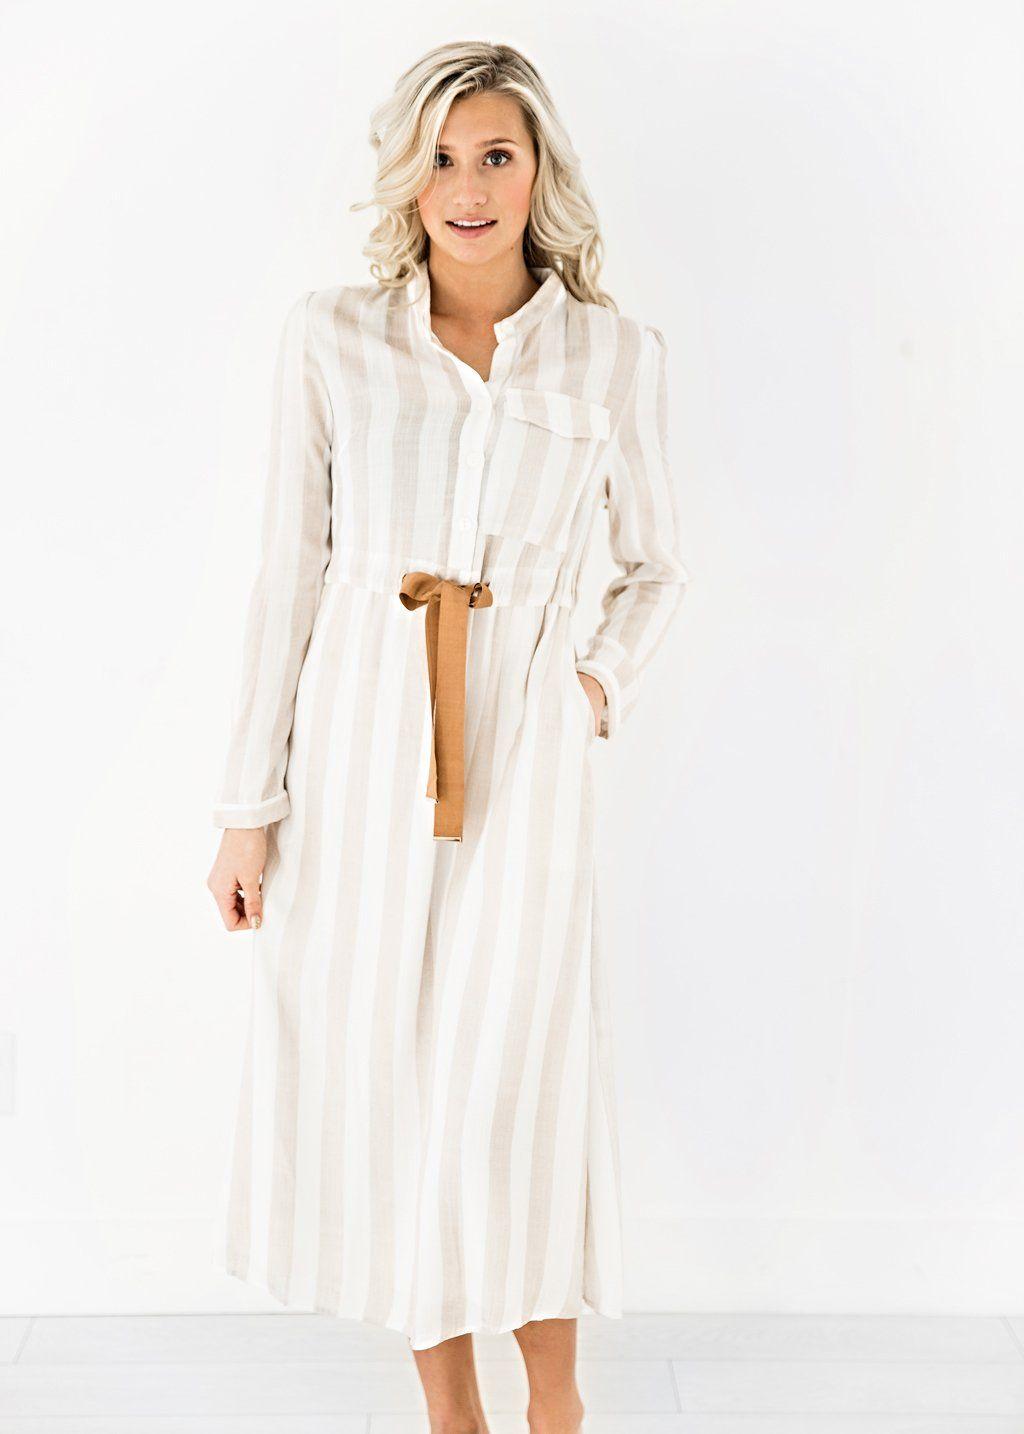 Picnic Striped Dress Jessakae New Arrivals Striped Dress Pocket Detail Womens Fashion Womens Style Tan White Beaut Fashion Dresses Clothes For Women [ 1434 x 1024 Pixel ]